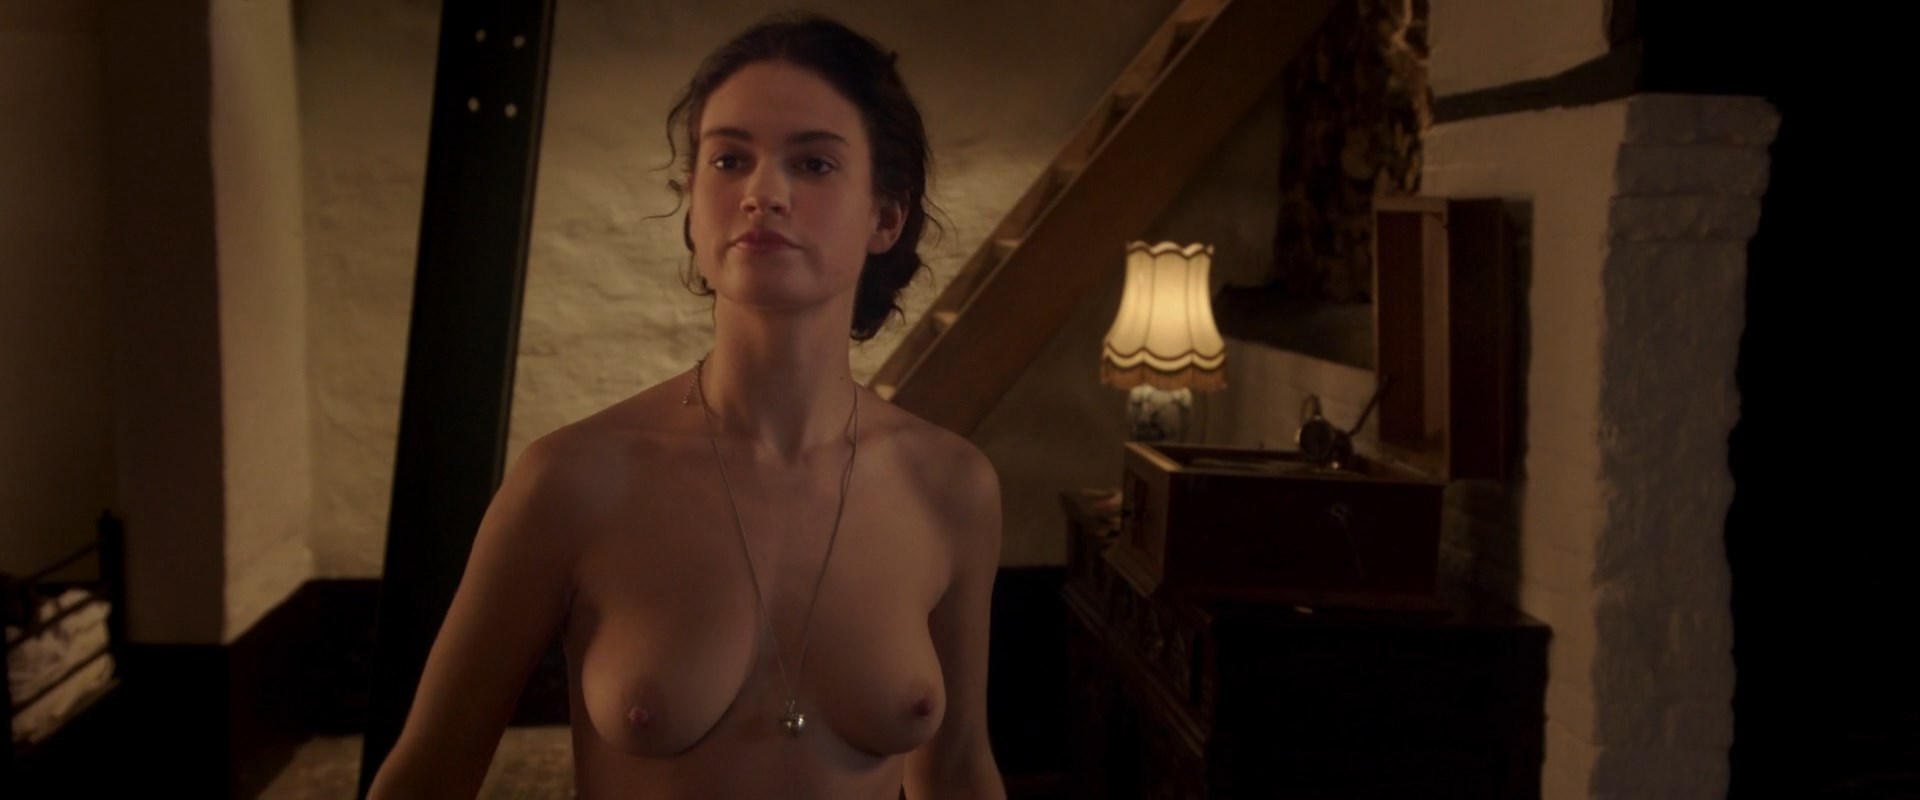 Erotica Georgina Rodriguez naked (44 foto and video), Pussy, Paparazzi, Instagram, panties 2017